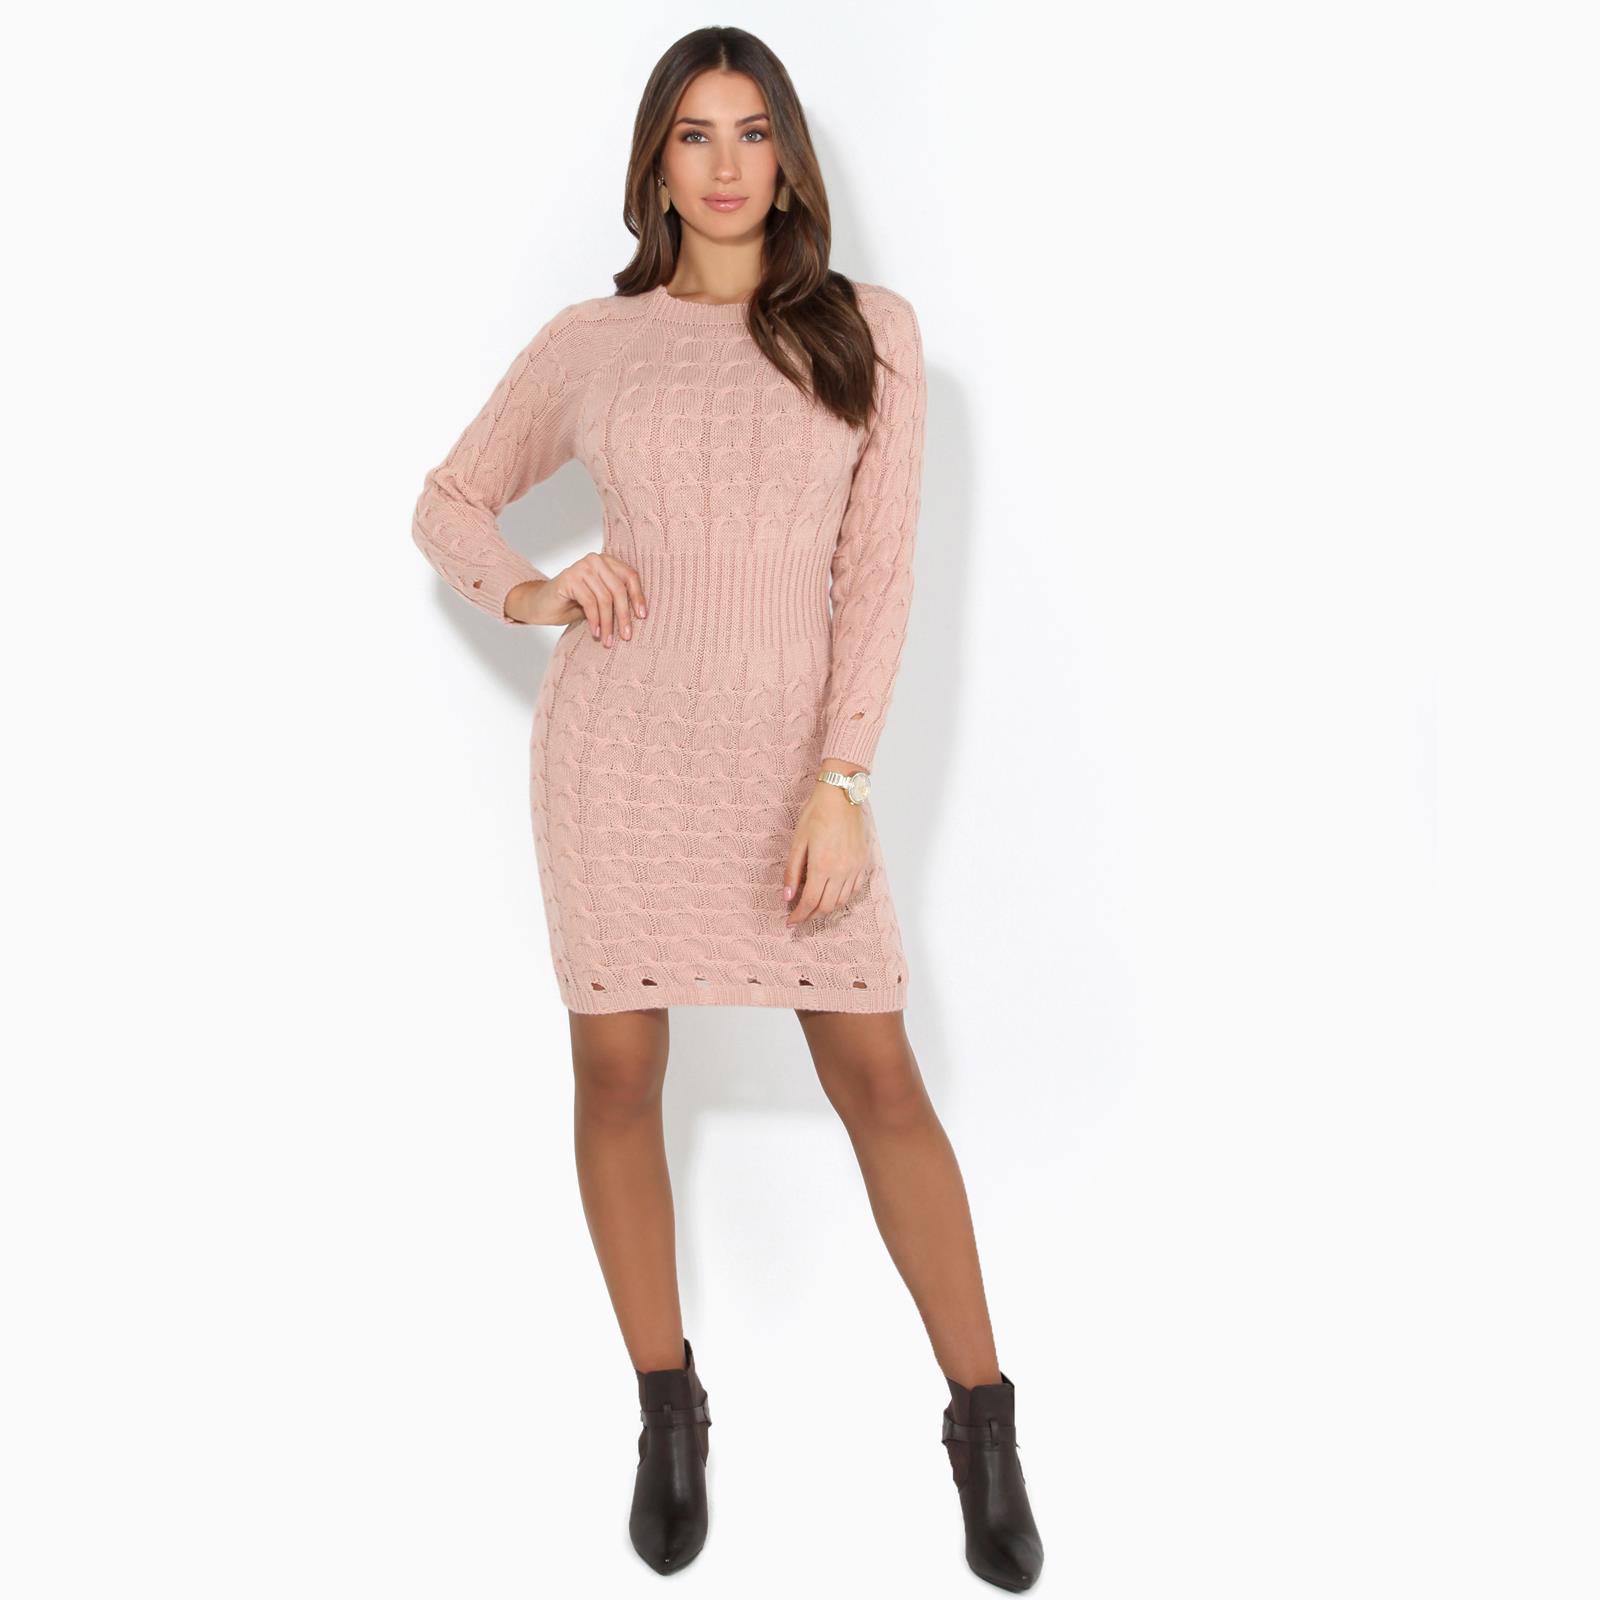 Womens-Ladies-Jumper-Dress-Longsleeve-Mini-Warm-Winter-Knit-Top-Bodycon thumbnail 15